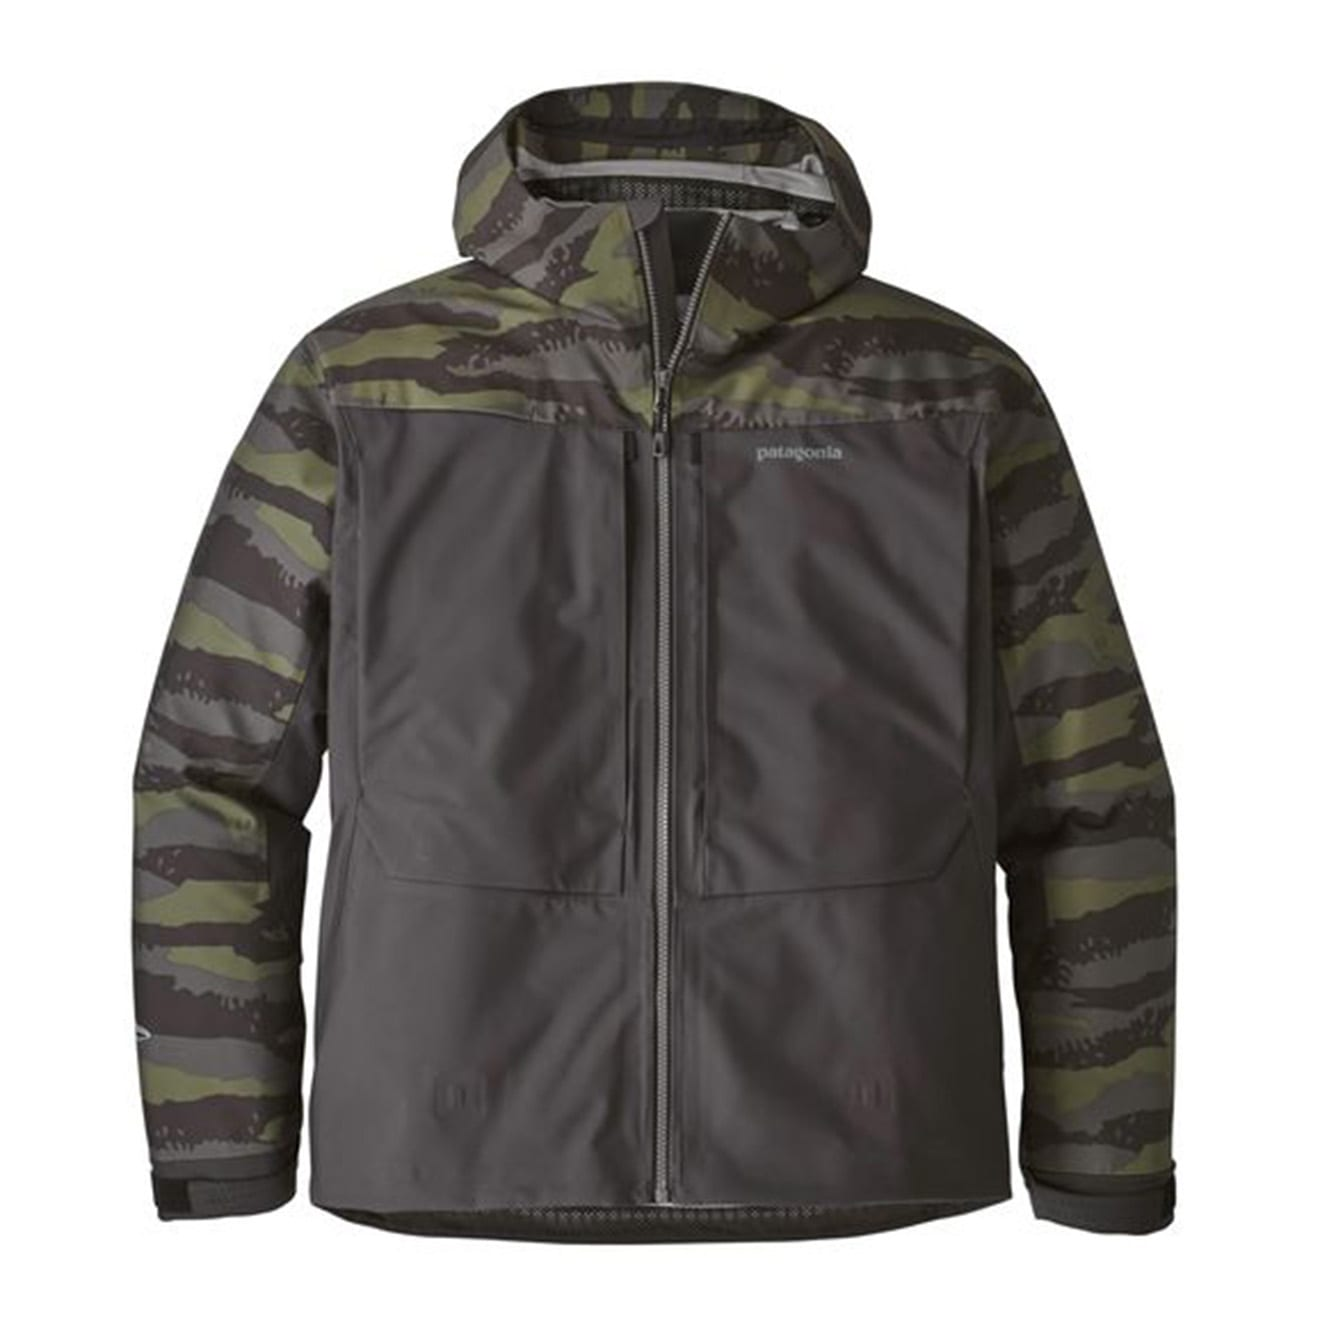 Patagonia river salt jacket rock camo ink black